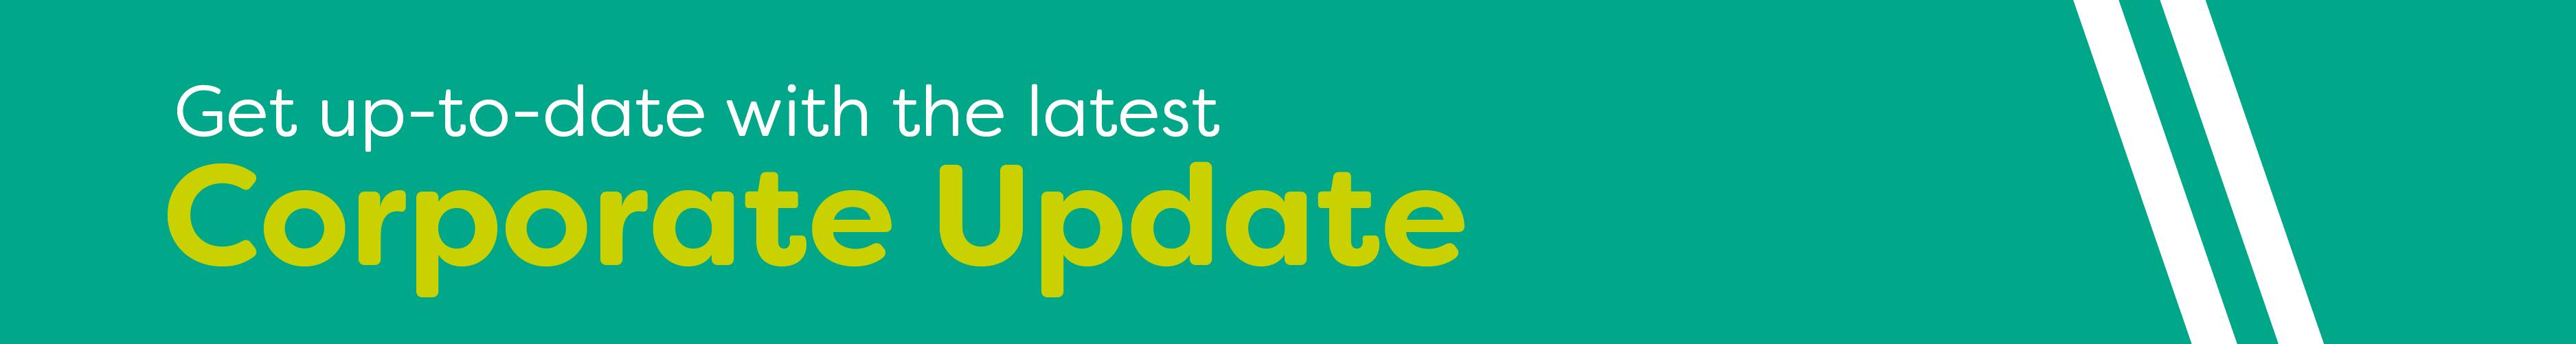 Corporate Update header banner